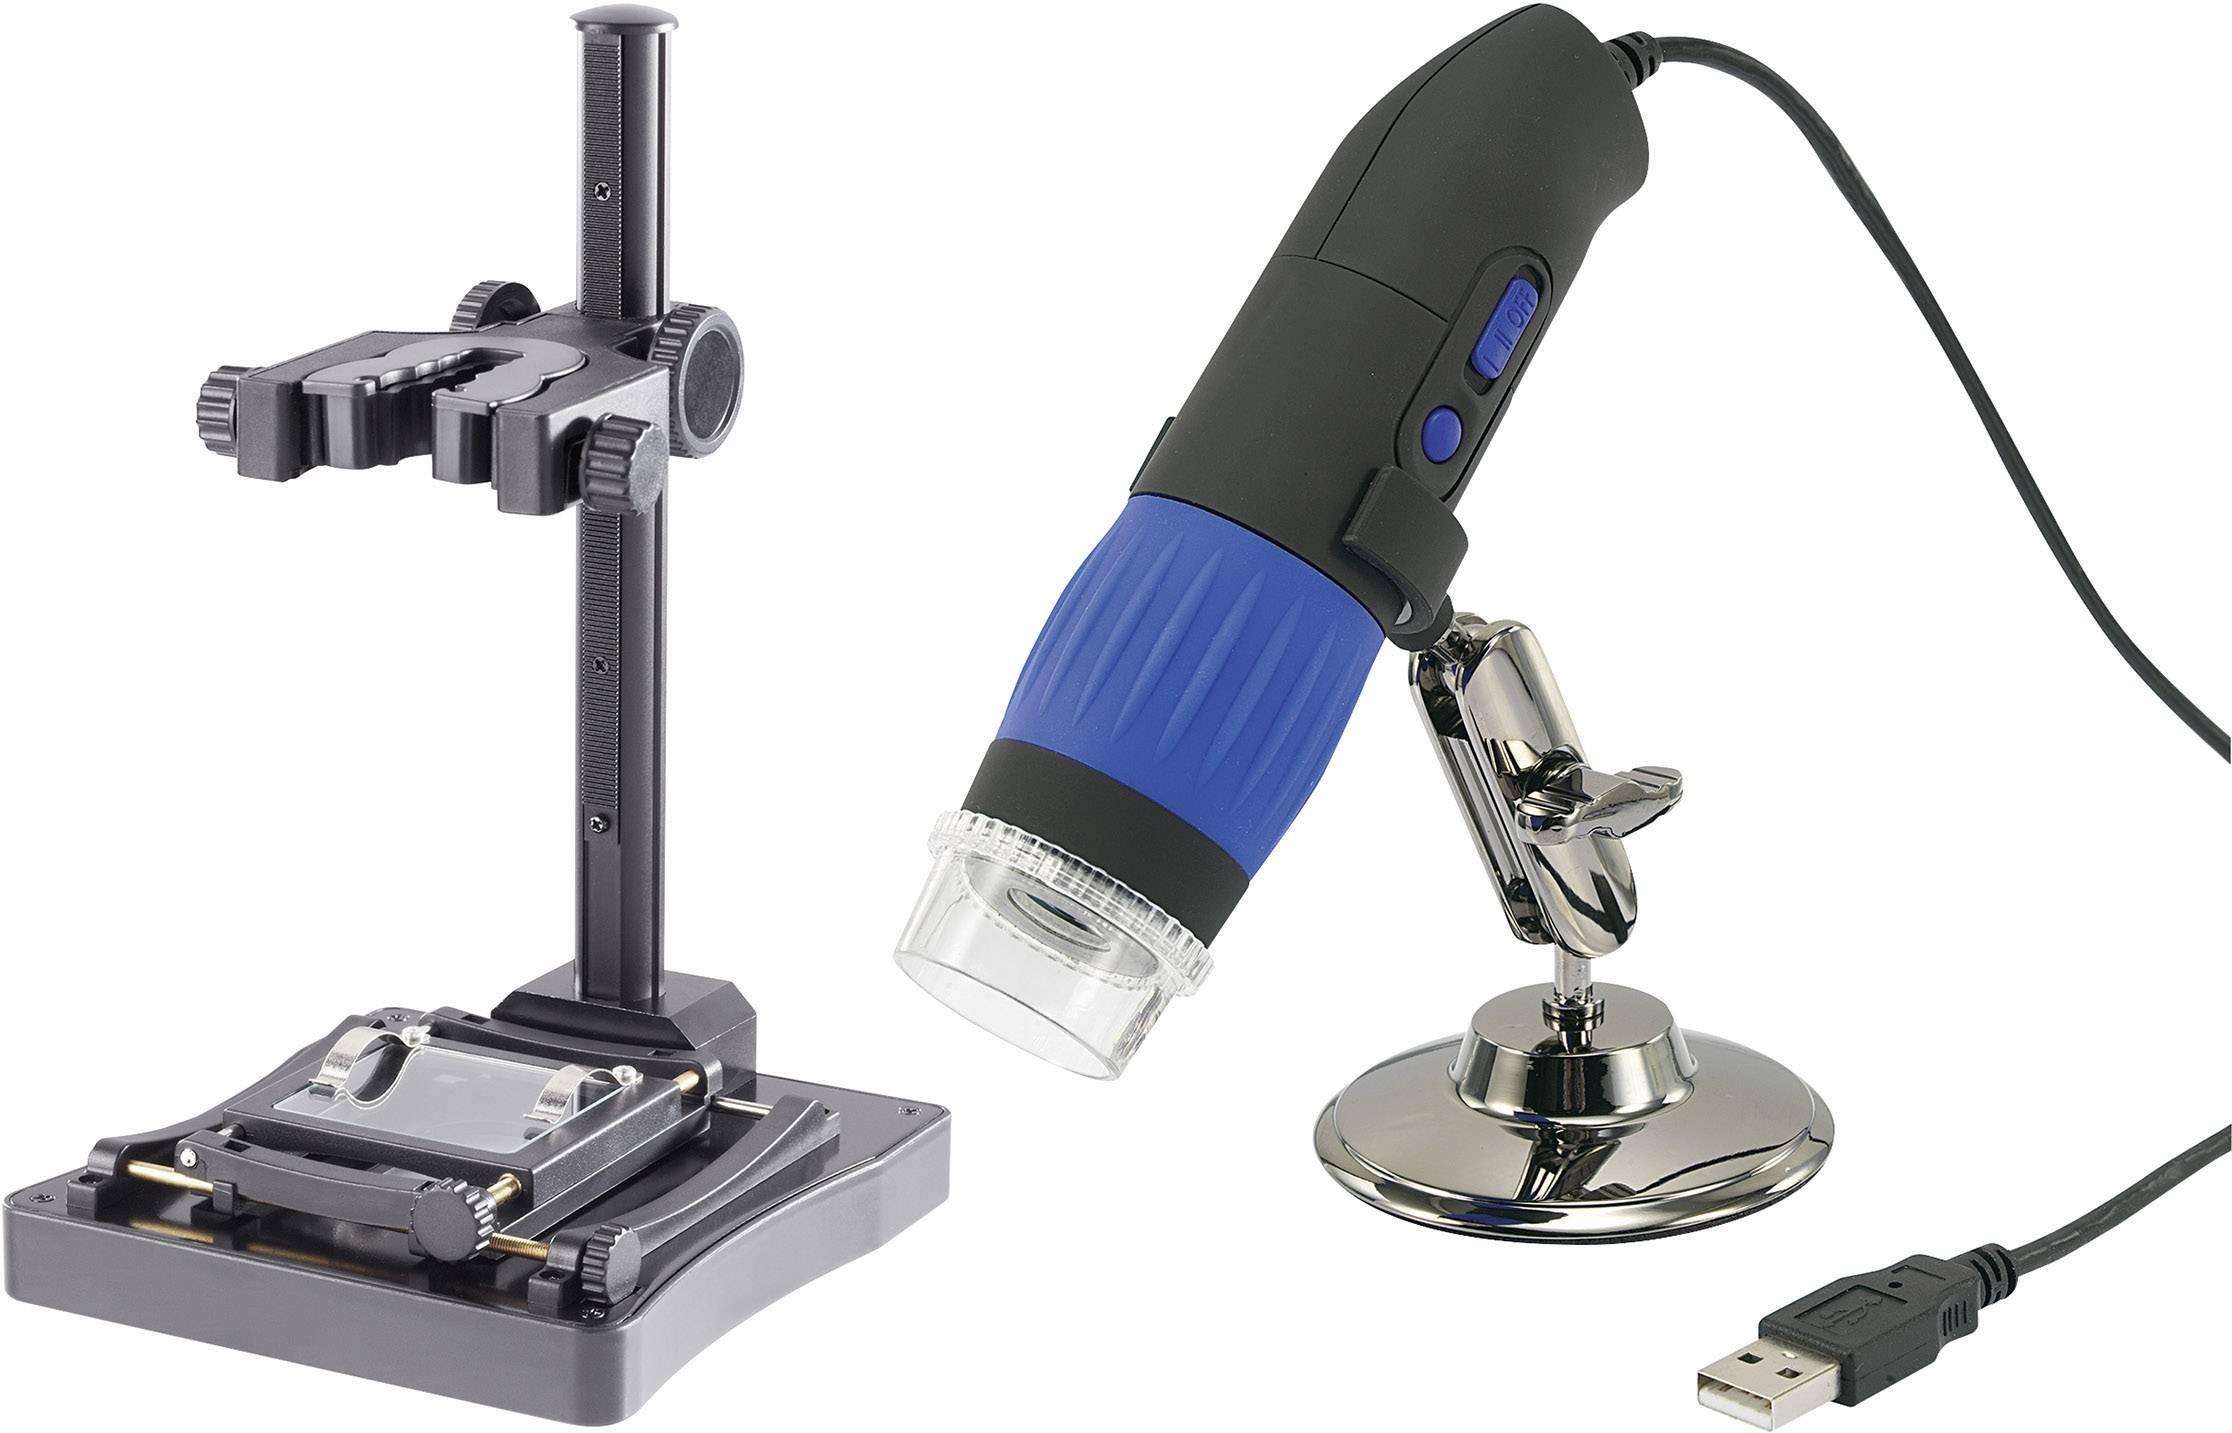 Usb mikroskop conrad components mio pixel digitale vergrößerung